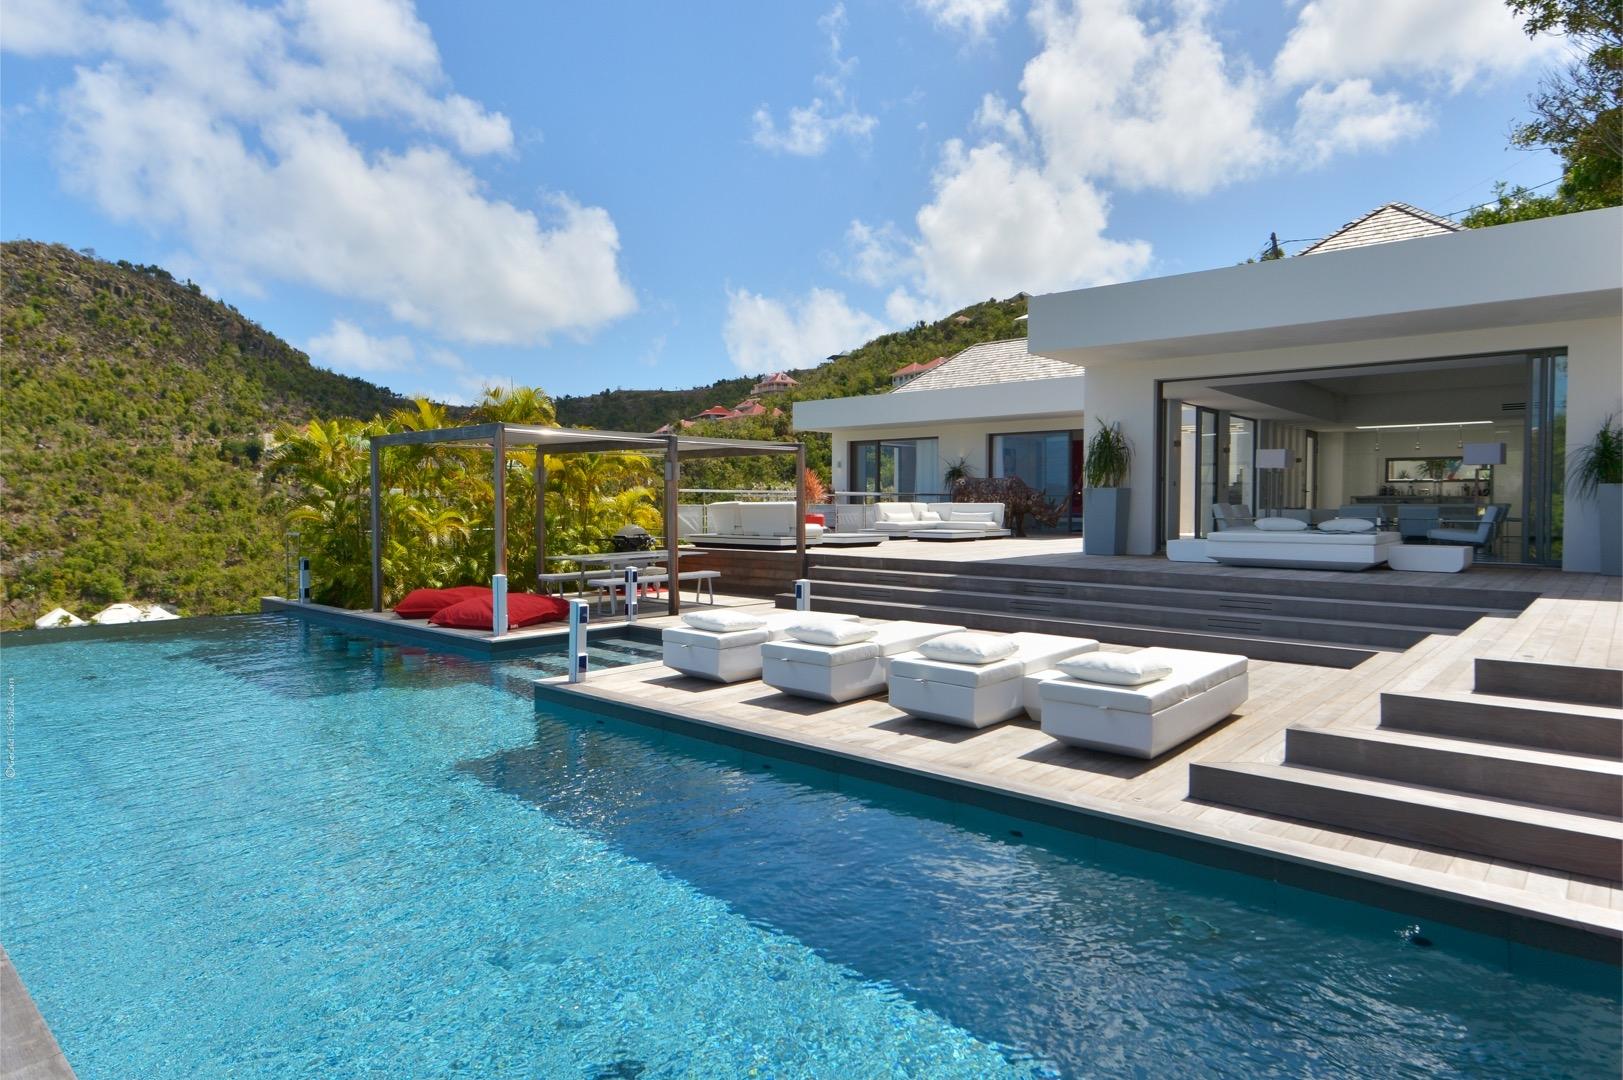 Luxury villa rentals caribbean - St barthelemy - Flamands - No location 4 - Eternity - Image 1/48